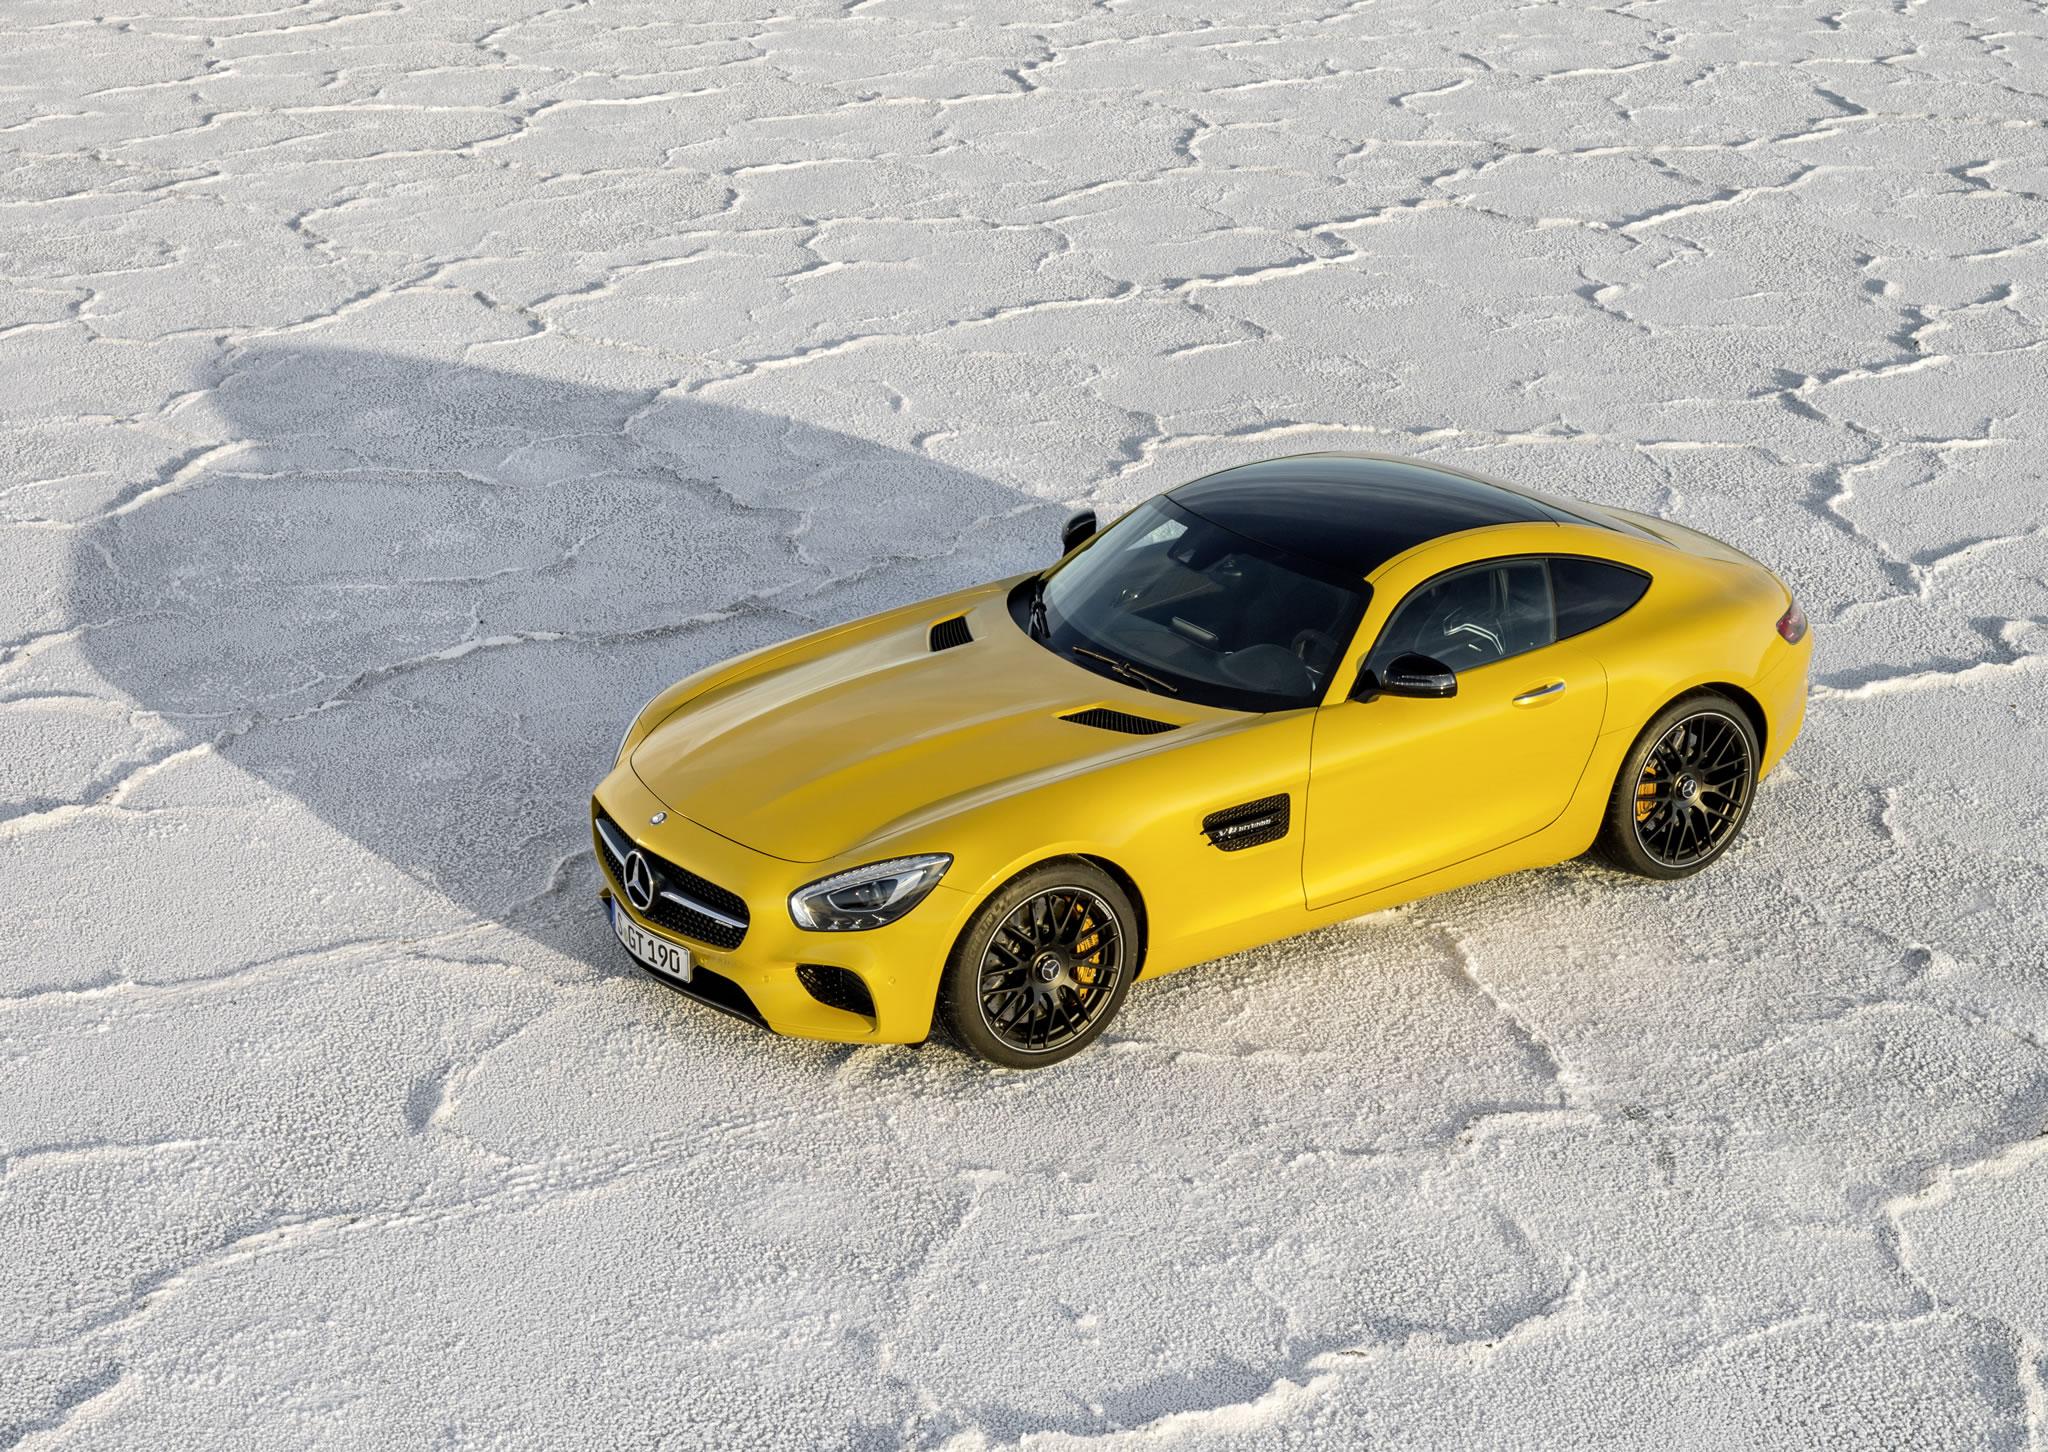 Mercedes-AMG GT Solarbeam